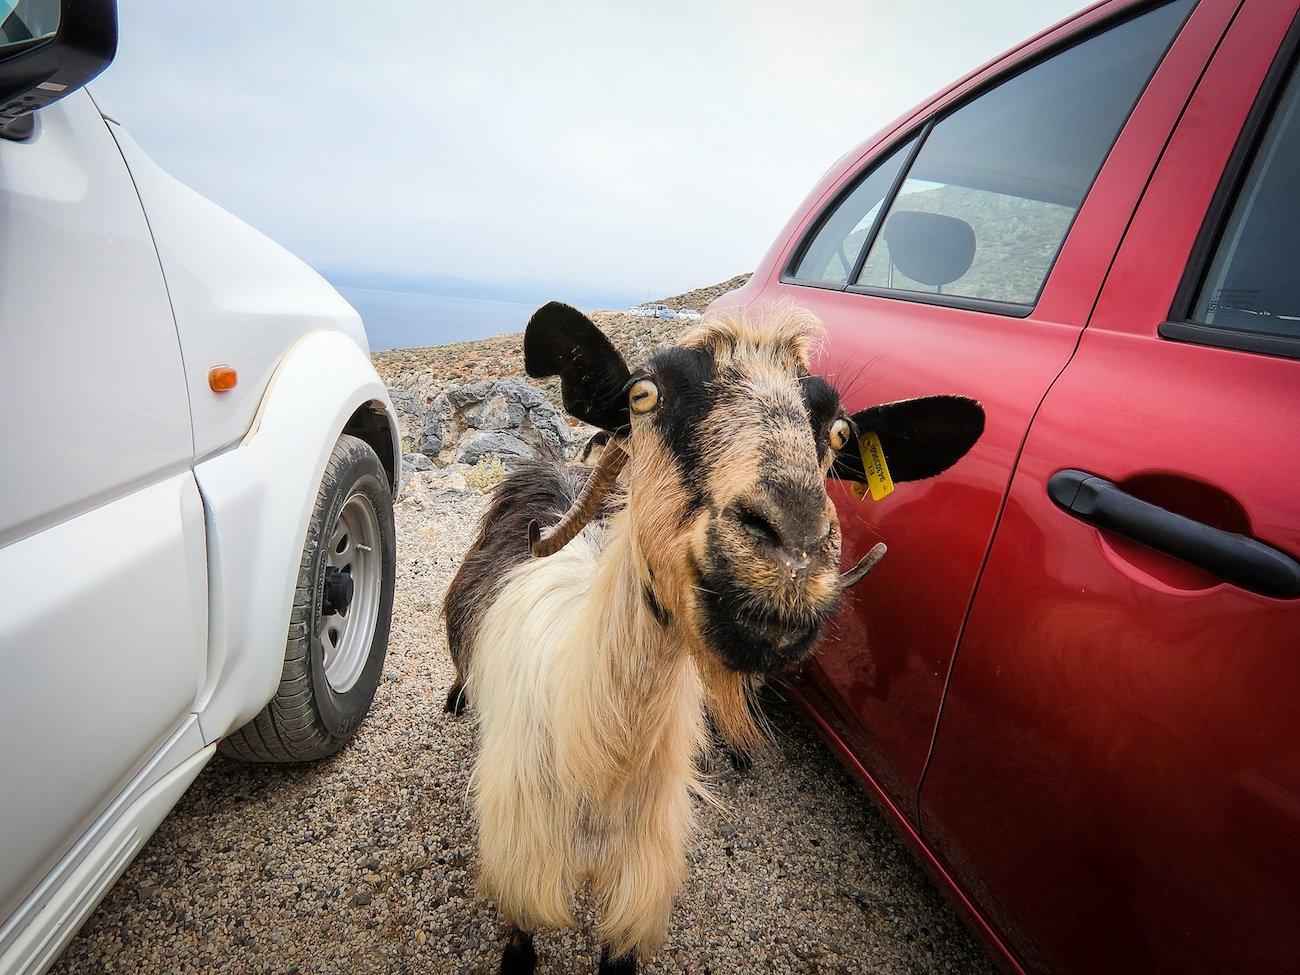 Goats Balos Beach Car Park Crete